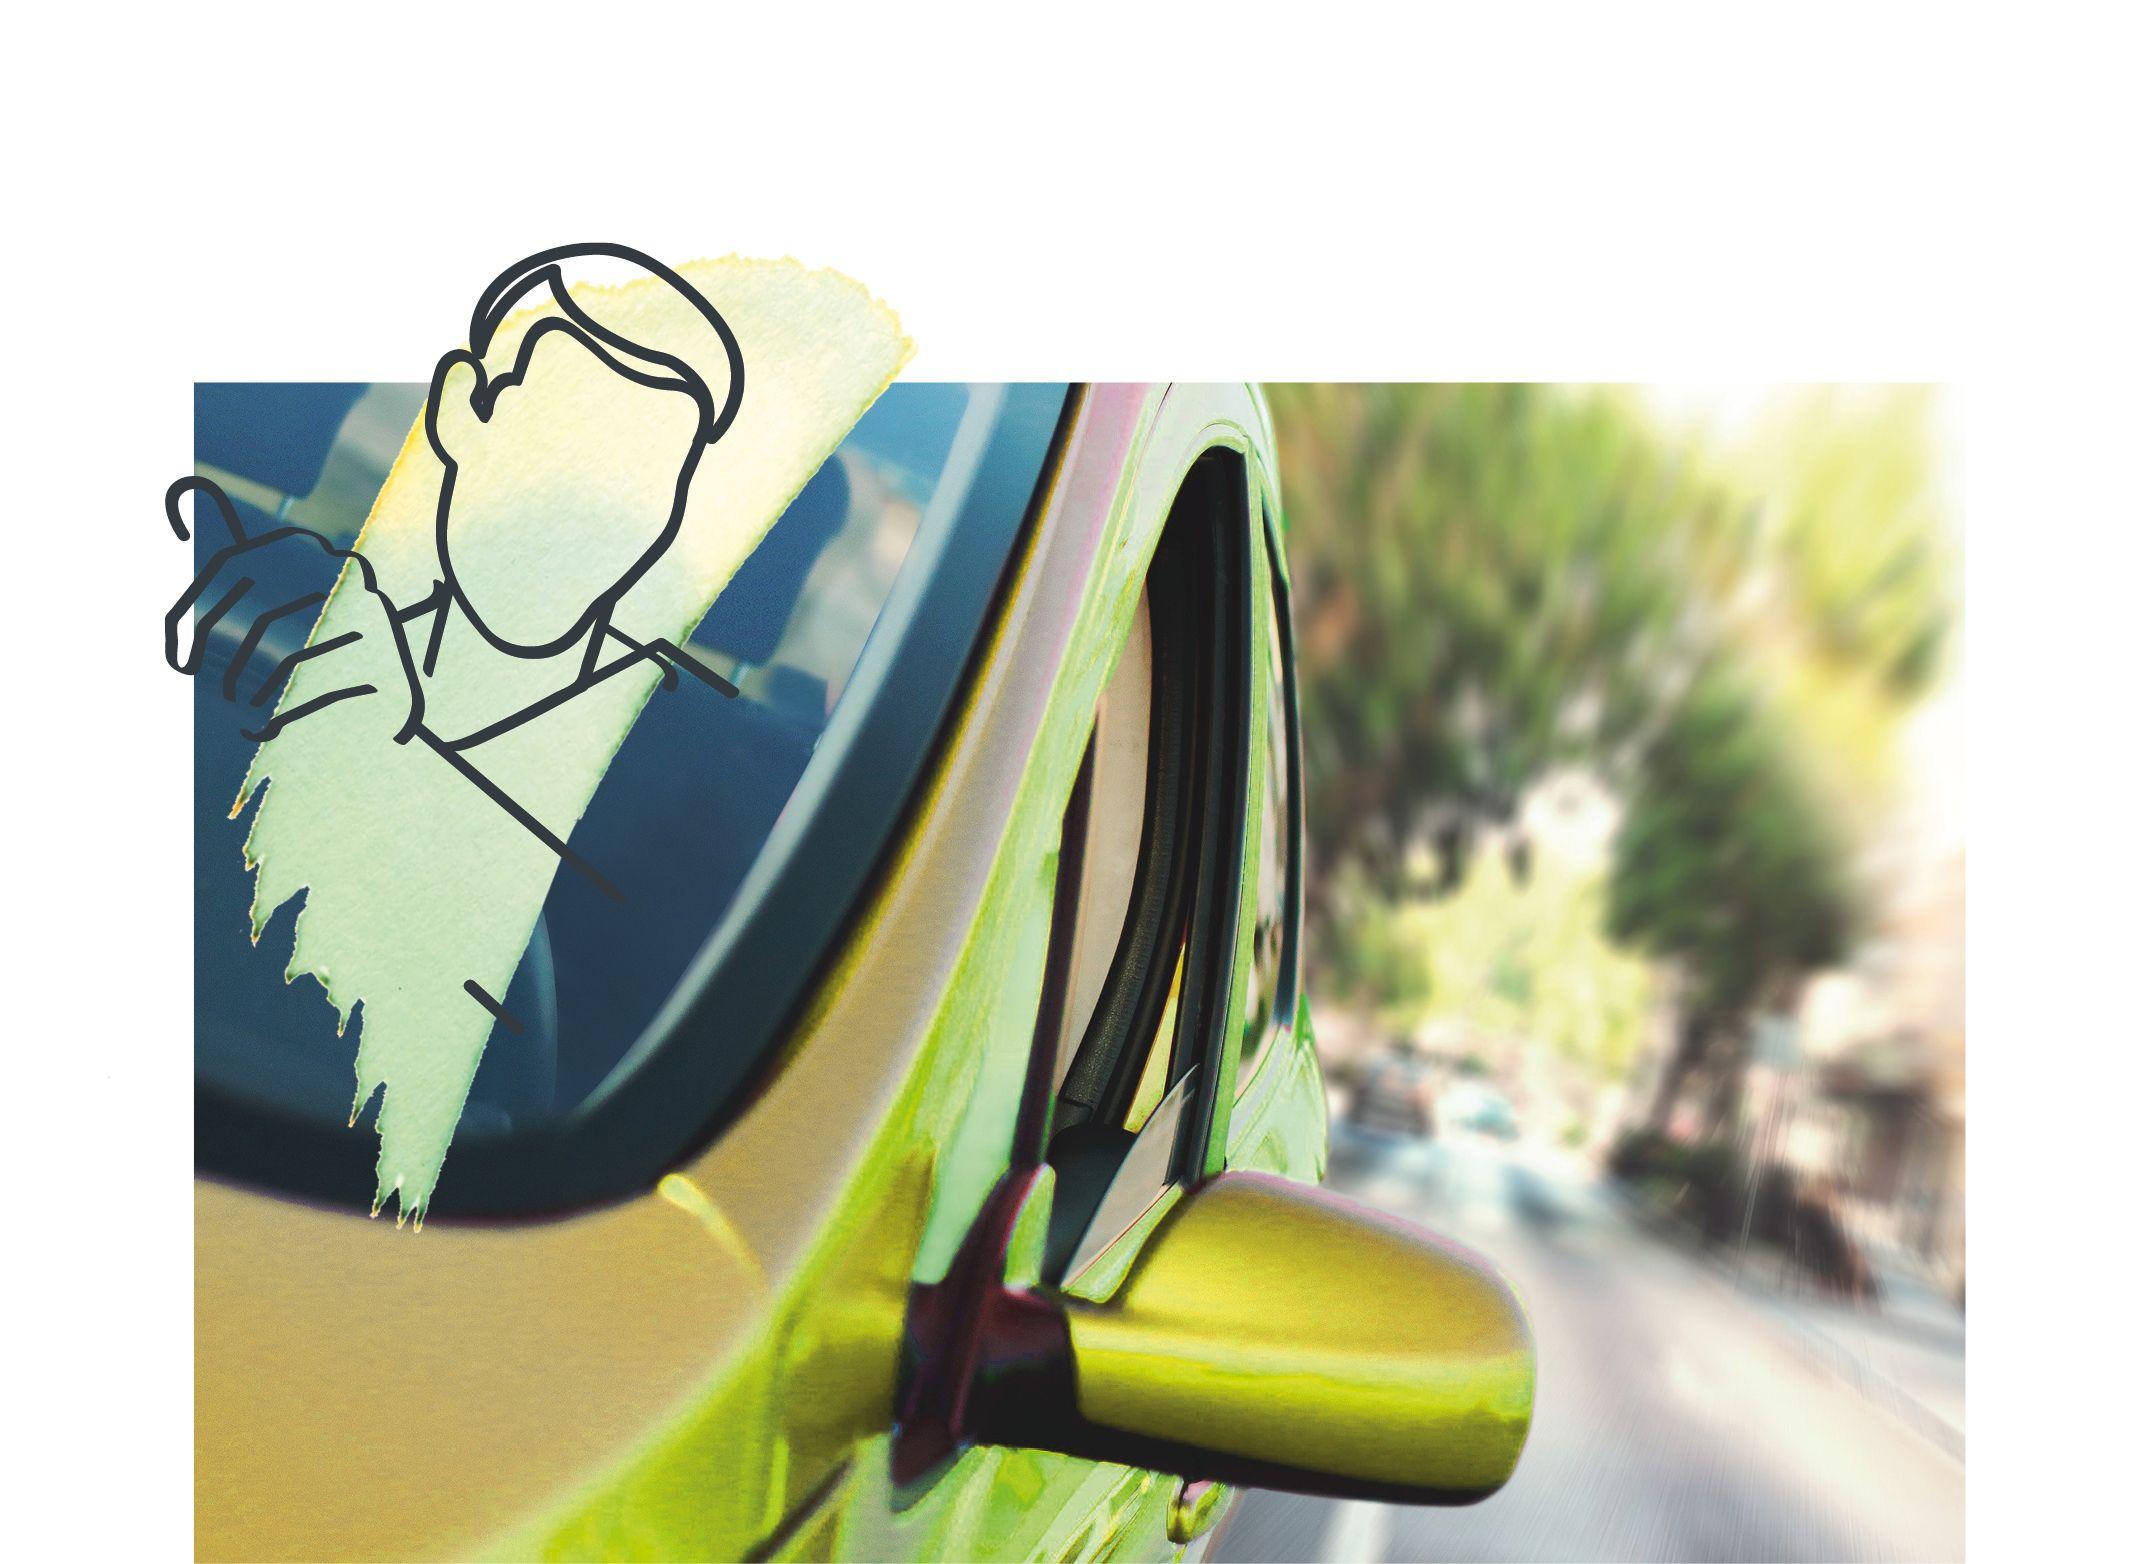 Zelfscan automobilisten 1 - ideate afbeelding